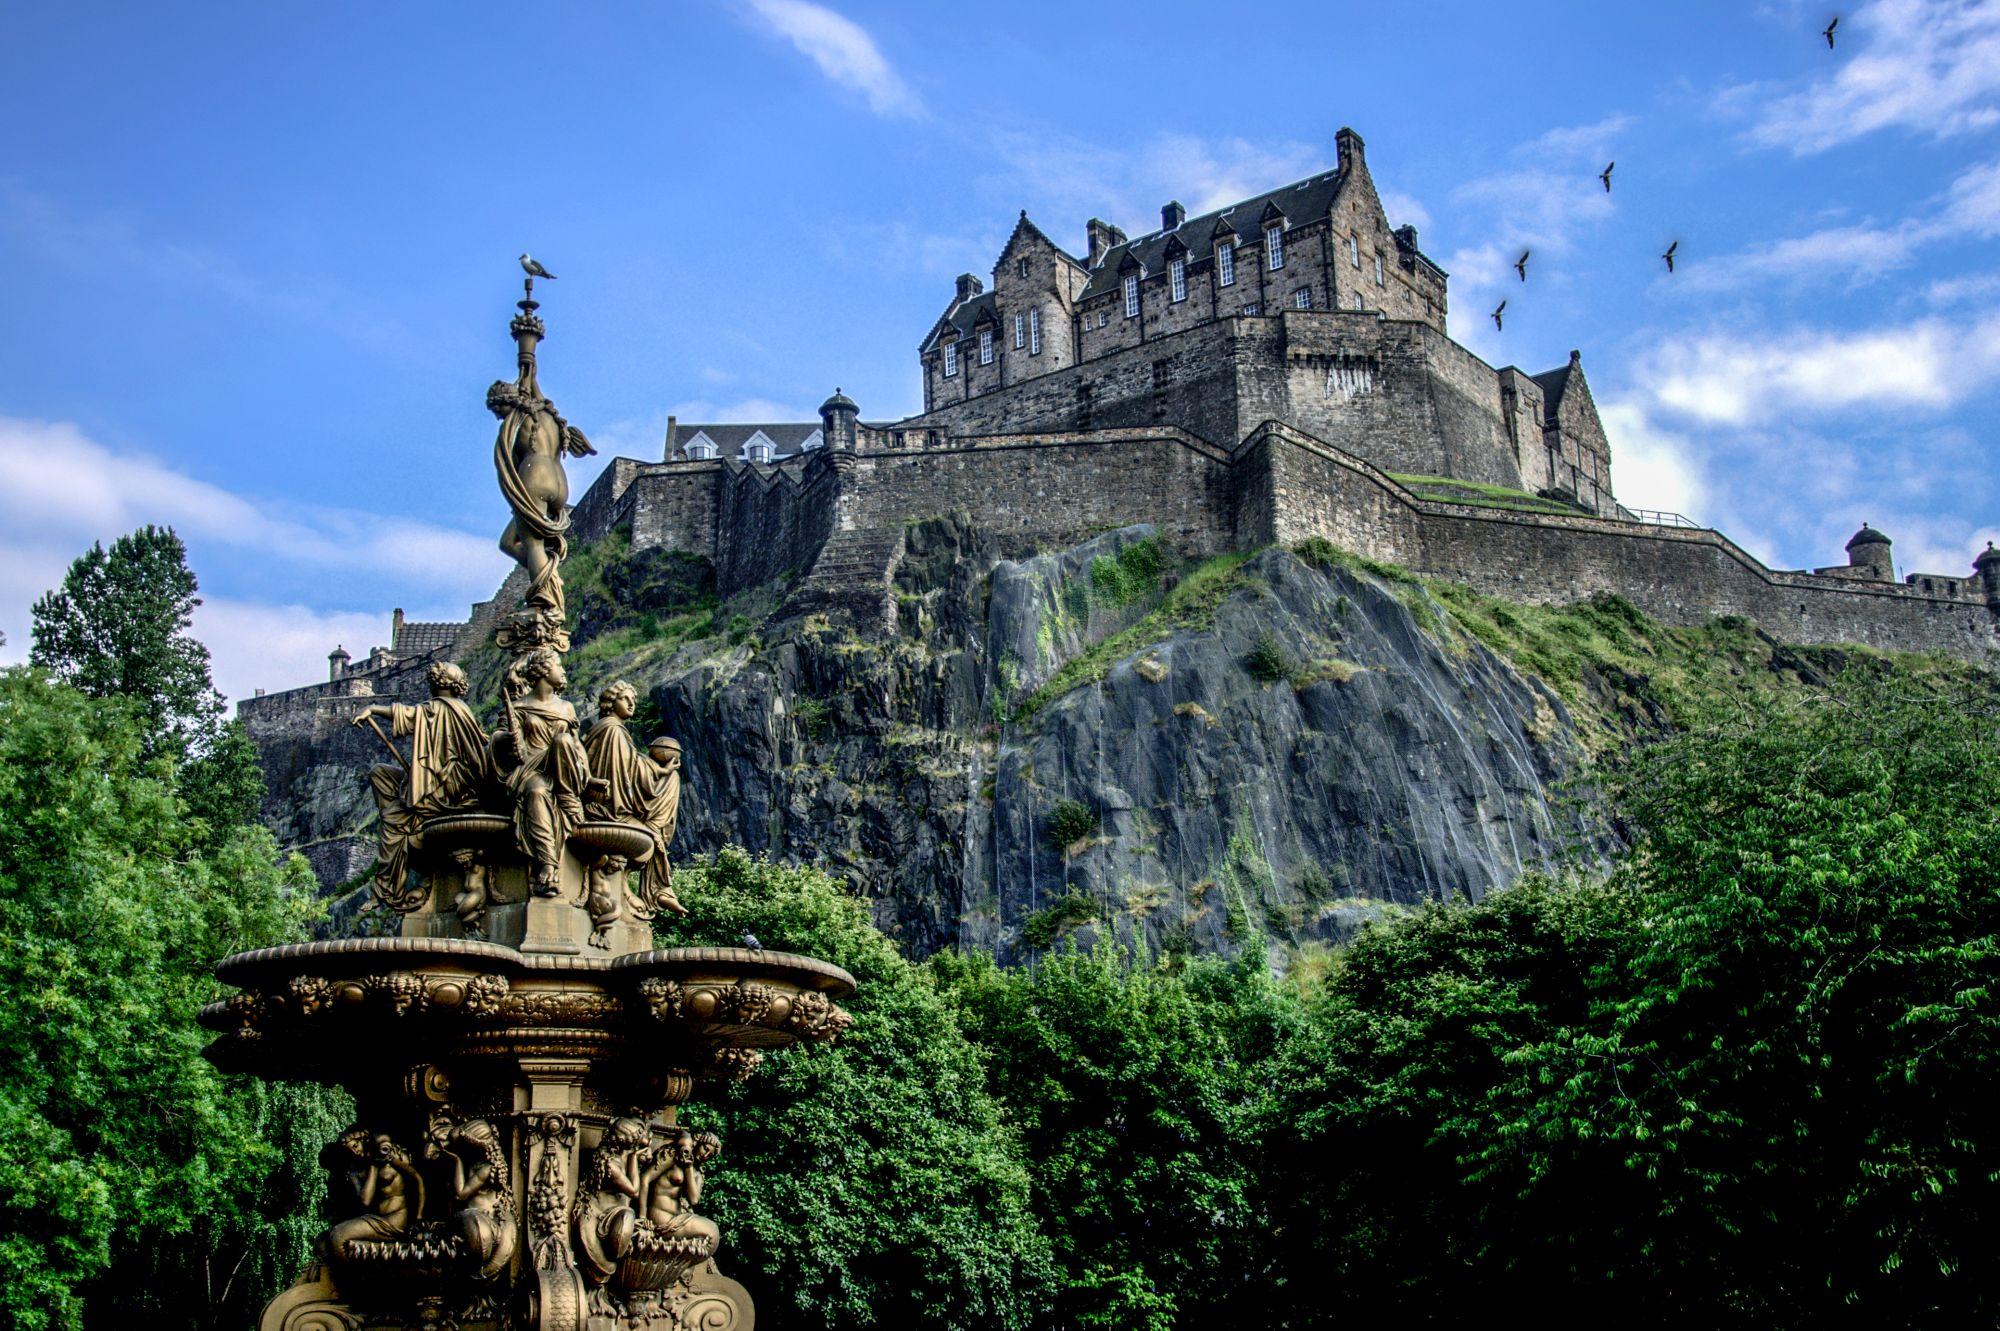 Edynburg widok zamku